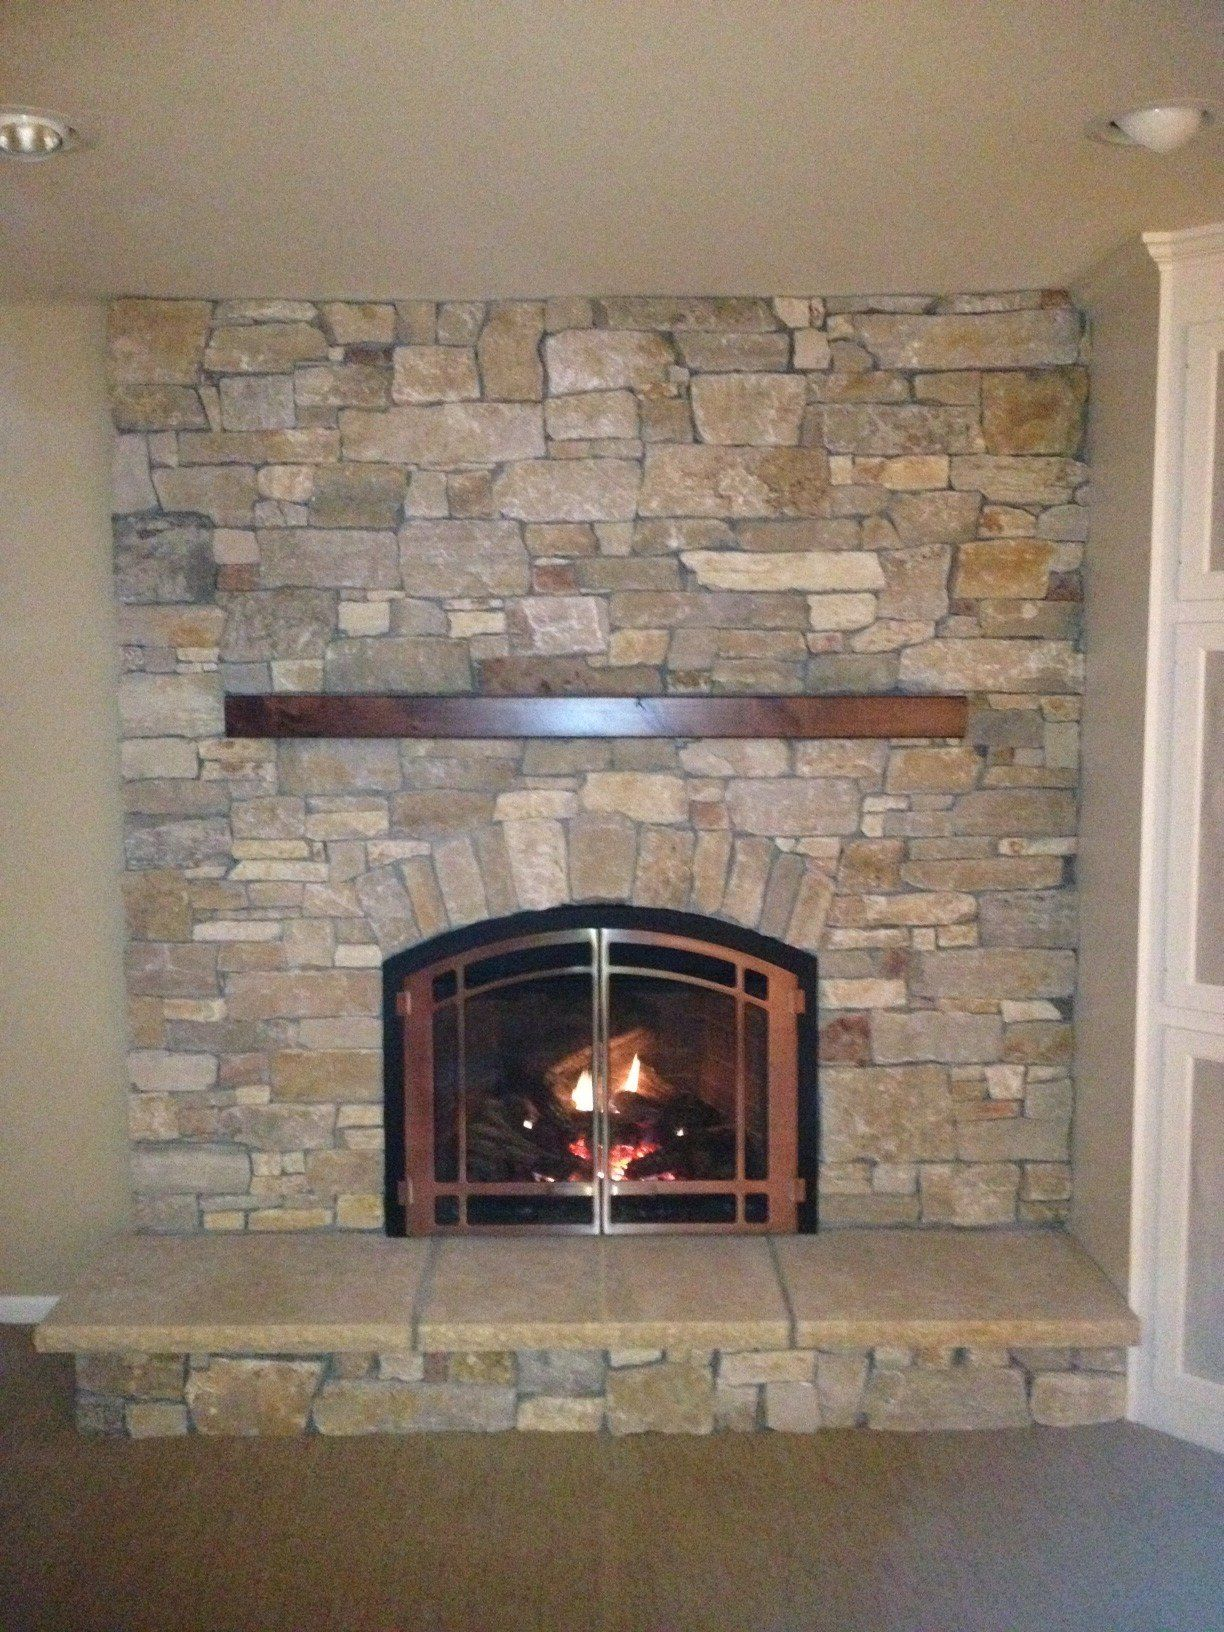 Painting Brick Indoor Fireplace Fireplace Ideas 1224x1632 Fireplaces Minneapolis Twin City Fireplace Casas